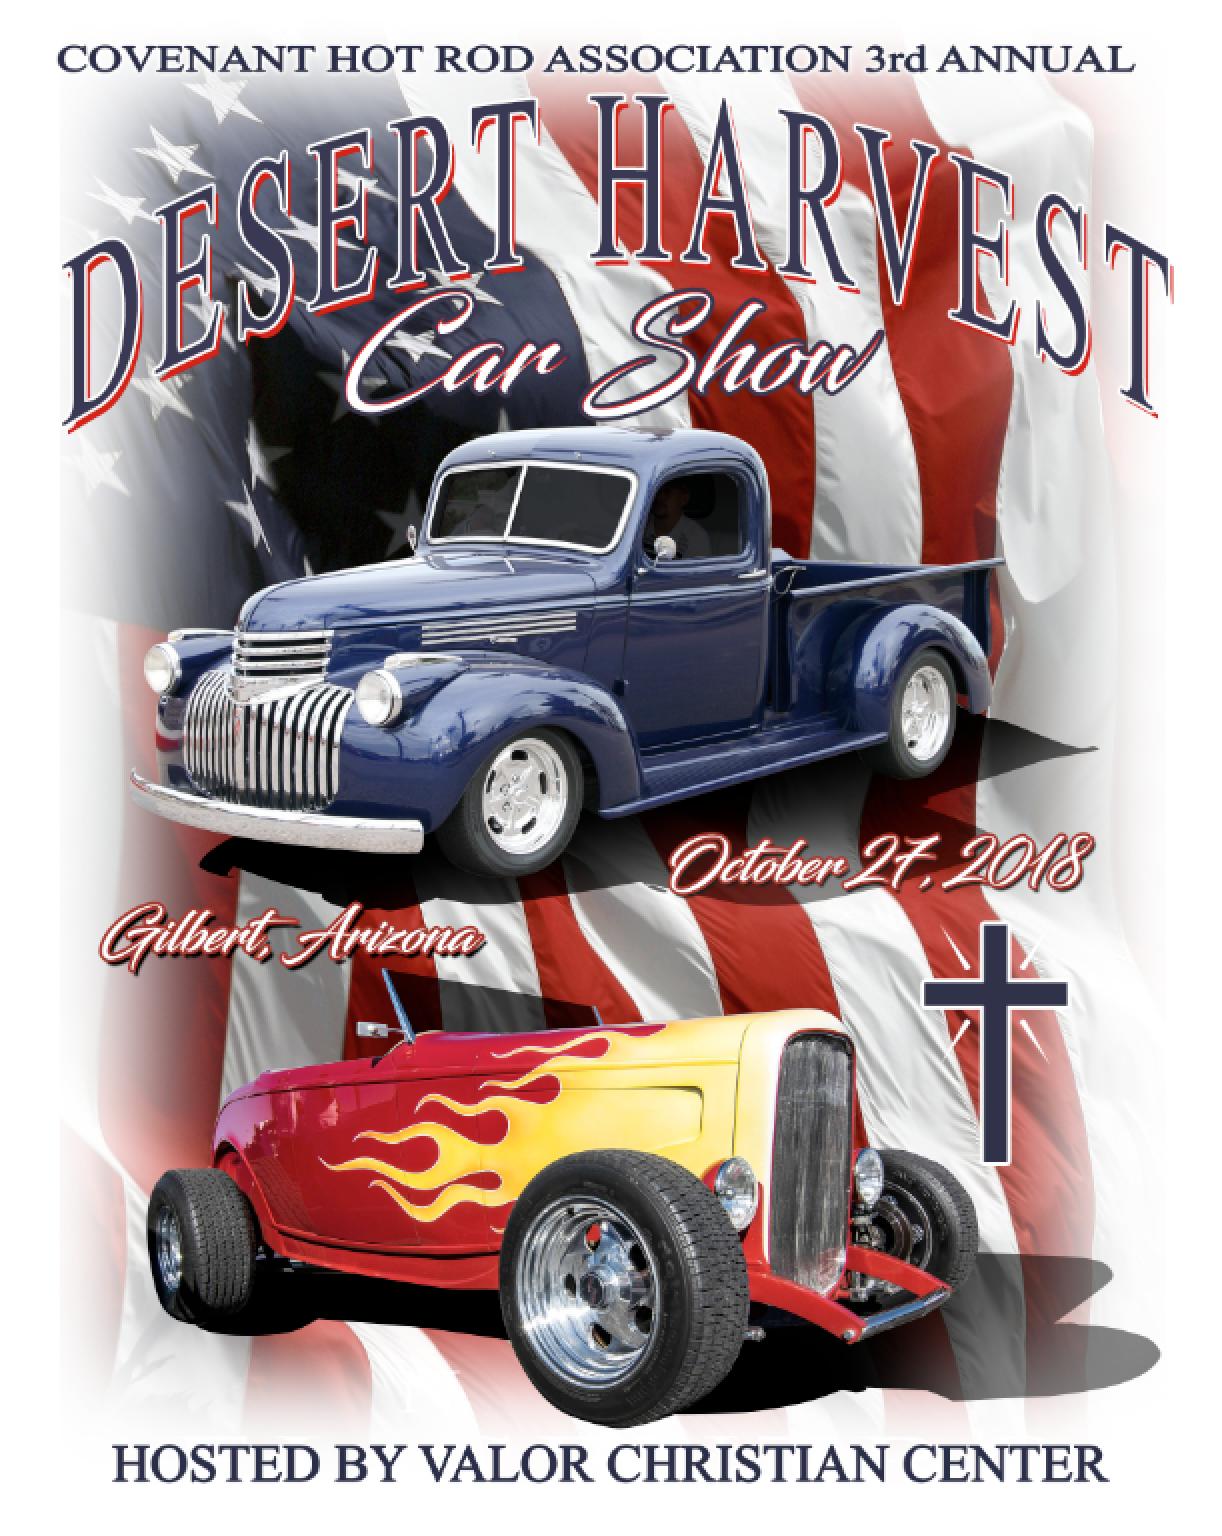 2018 DHS Car Show Design